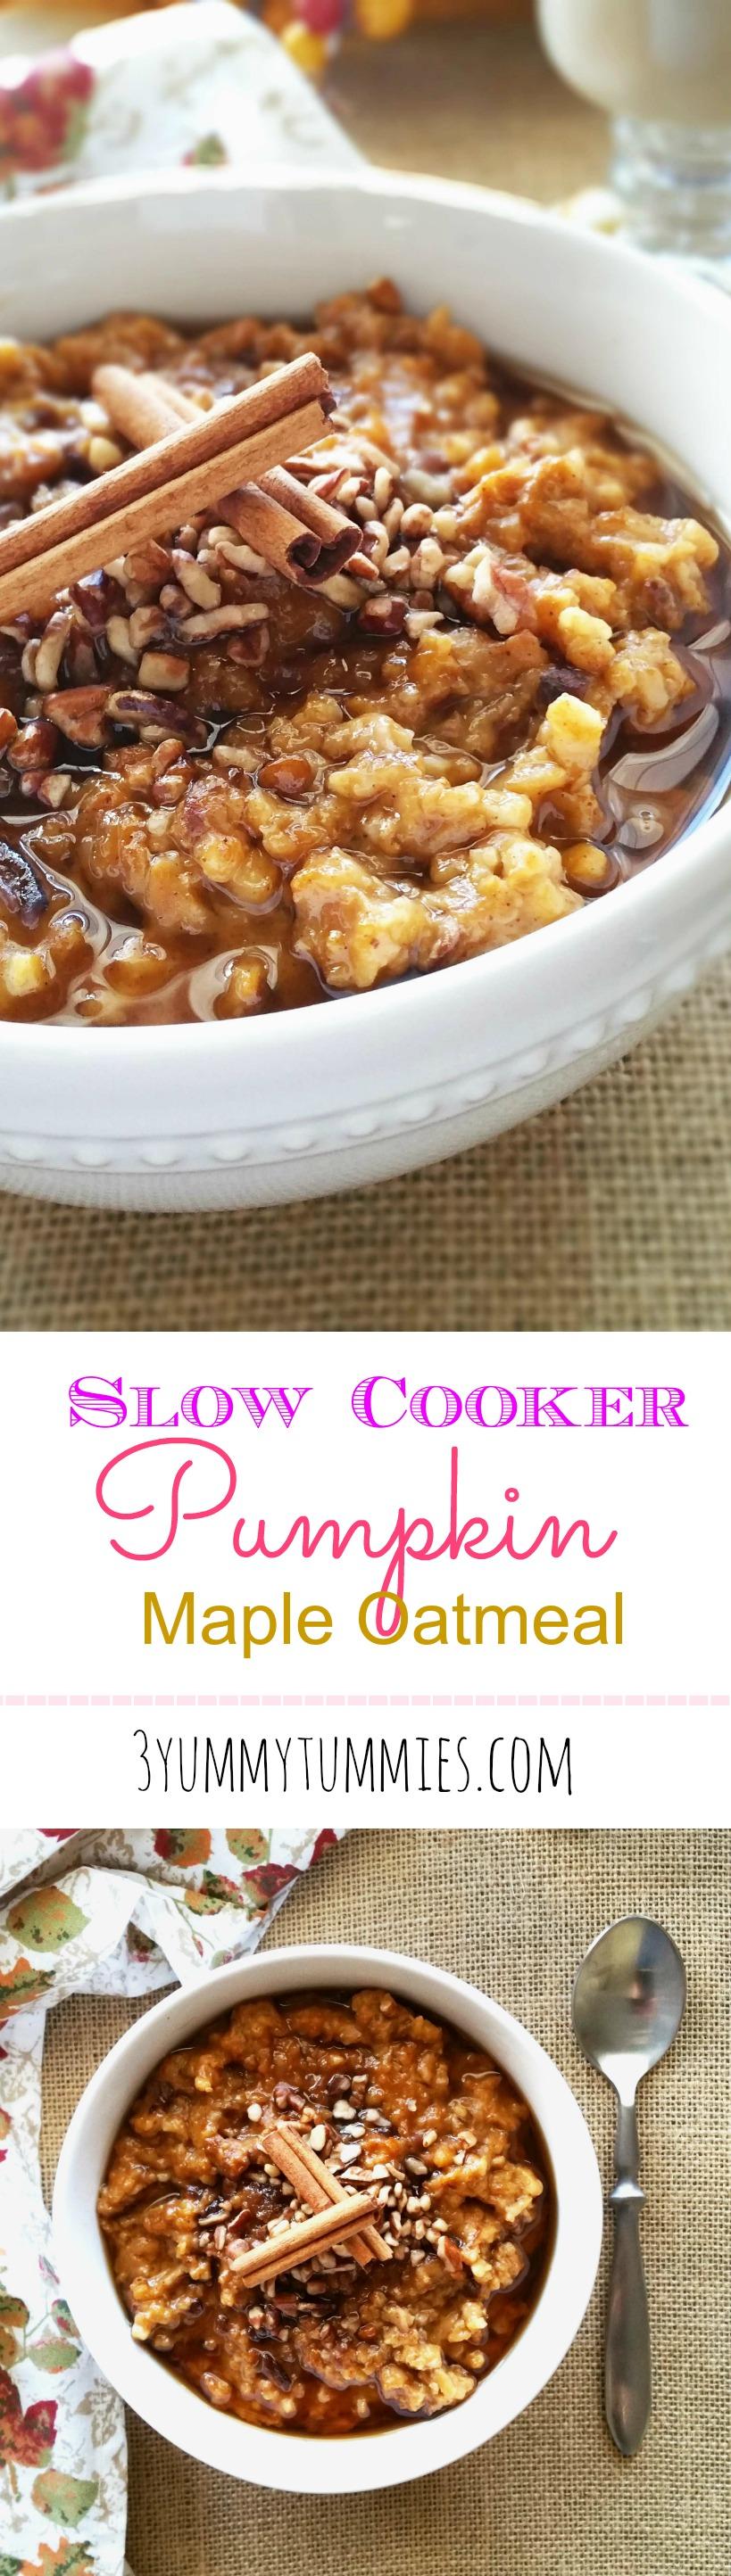 Slow Cooker Pumpkin Maple Oatmeal | 3 Yummy Tummies